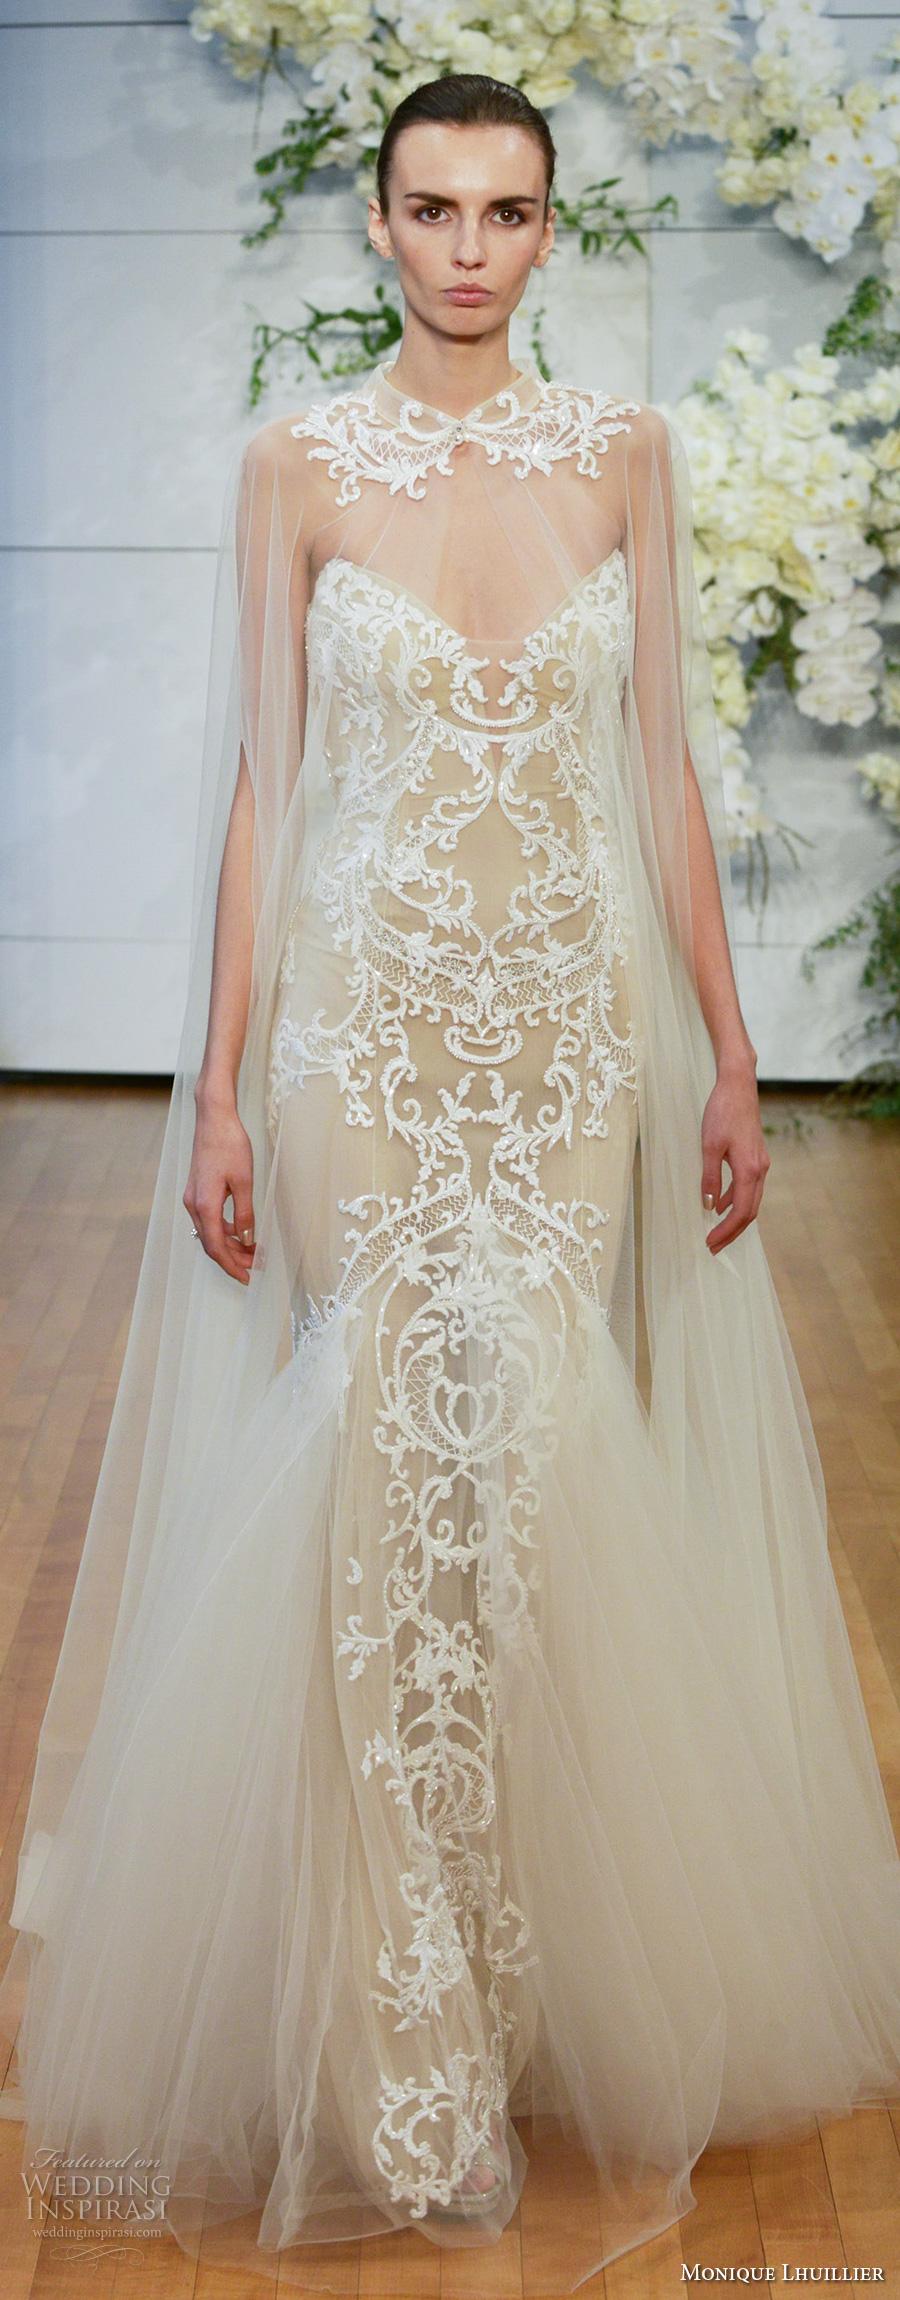 monique lhuillier spring 2018 bridal hanging sleeves illusion high neck sweetheart neckline full embellishment elegant glamorous sheath wedding dress chapel train (bastille) mv